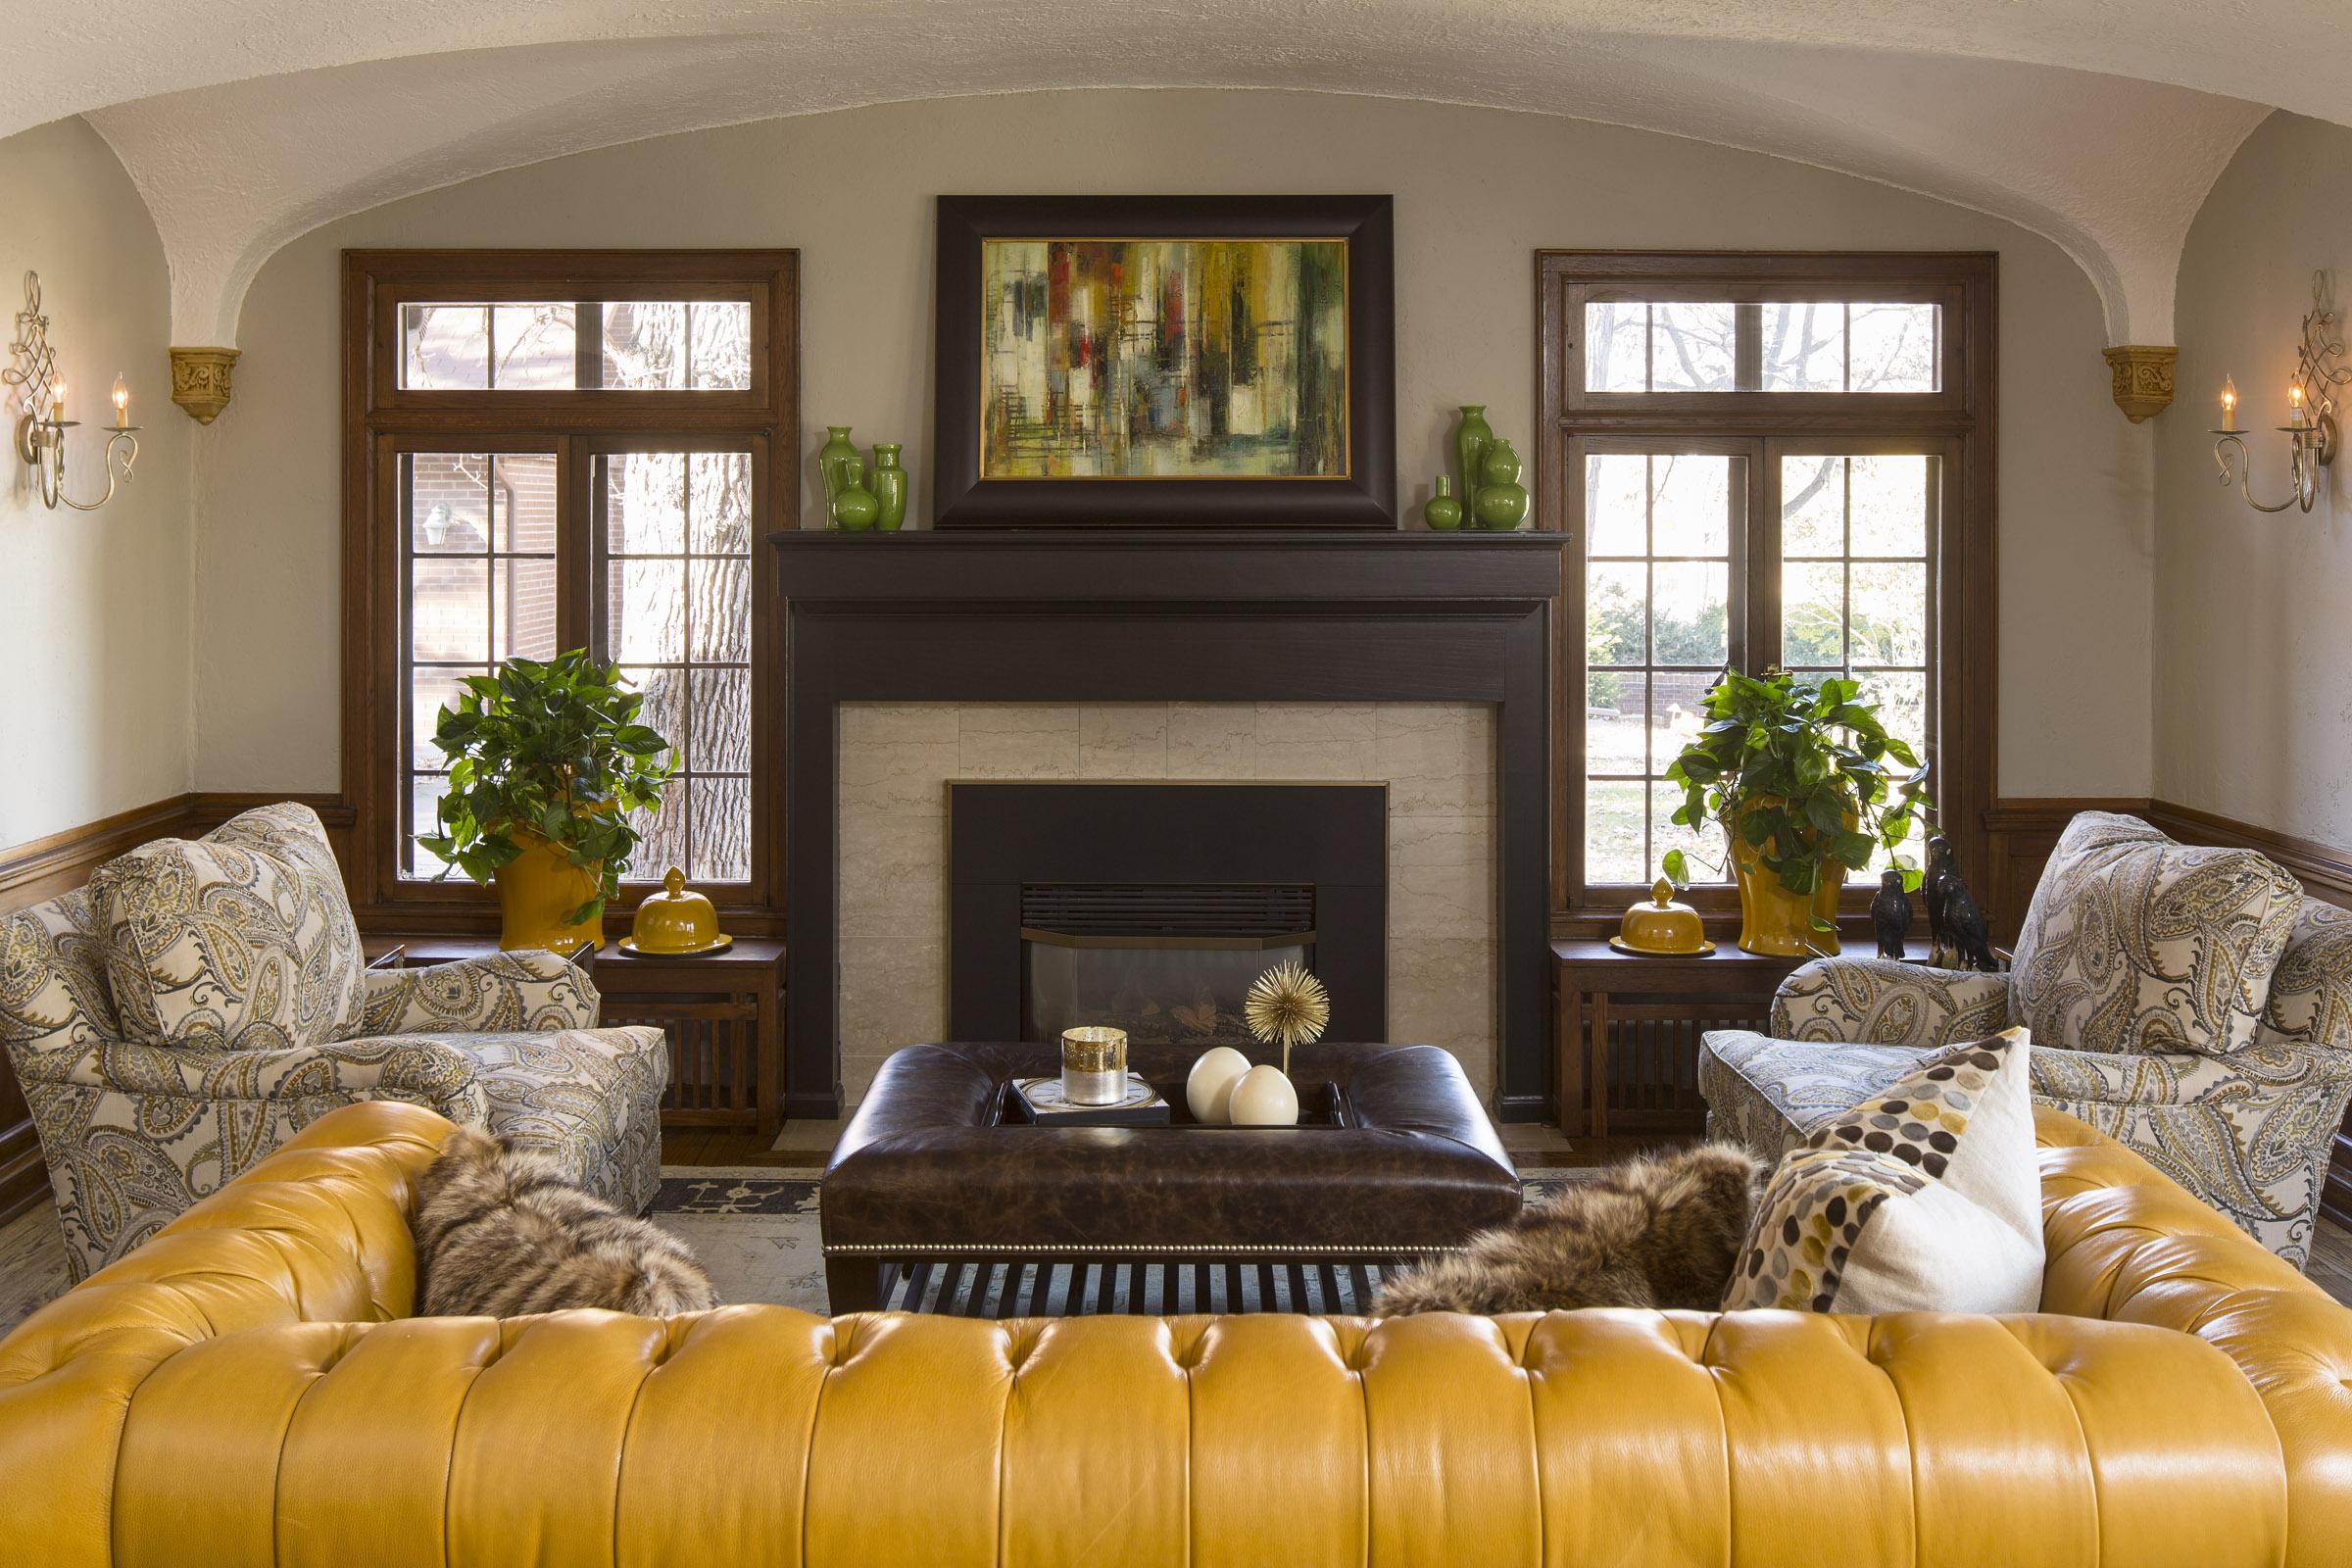 Insite-Interiors-Mpls-Condo-Living-Room.jpg